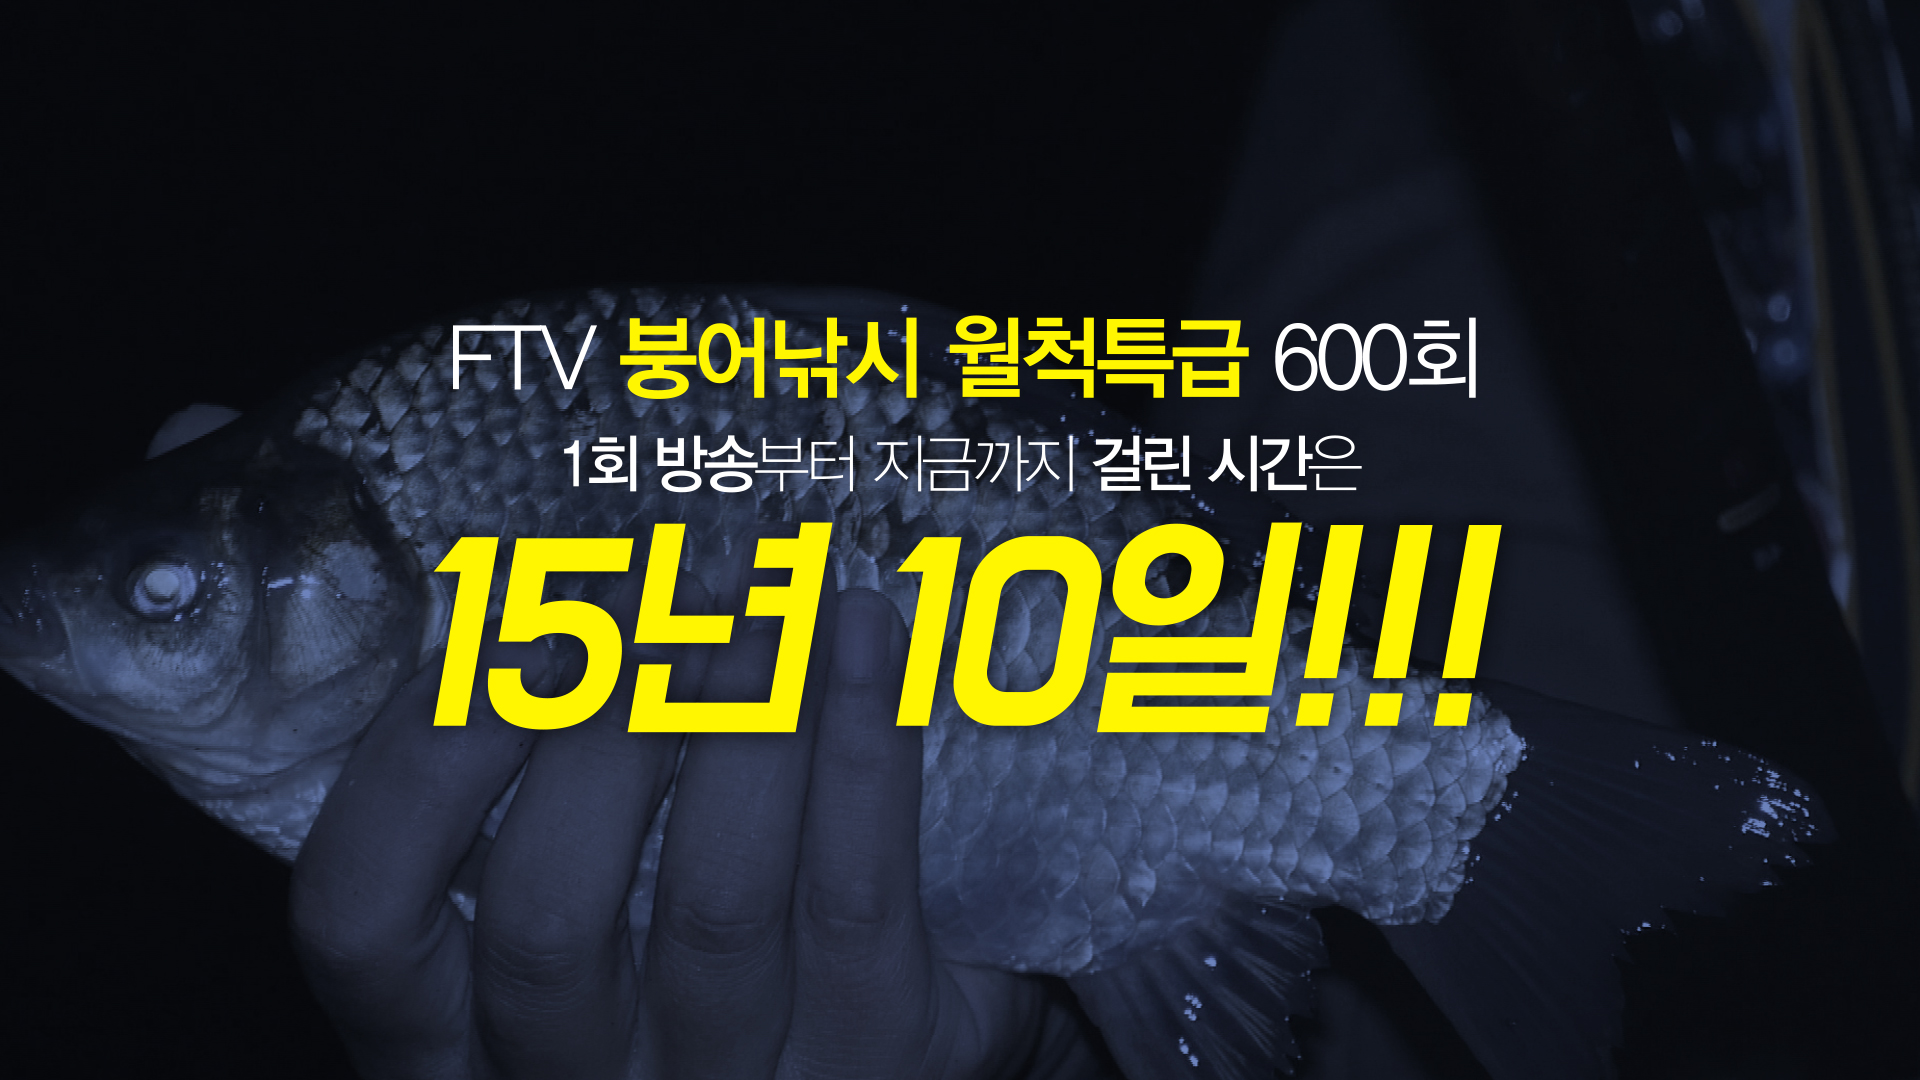 FTV '붕어낚시 월척특급' 600회...케이블방송 최장수 프로그램·15년 10일간의 대기록